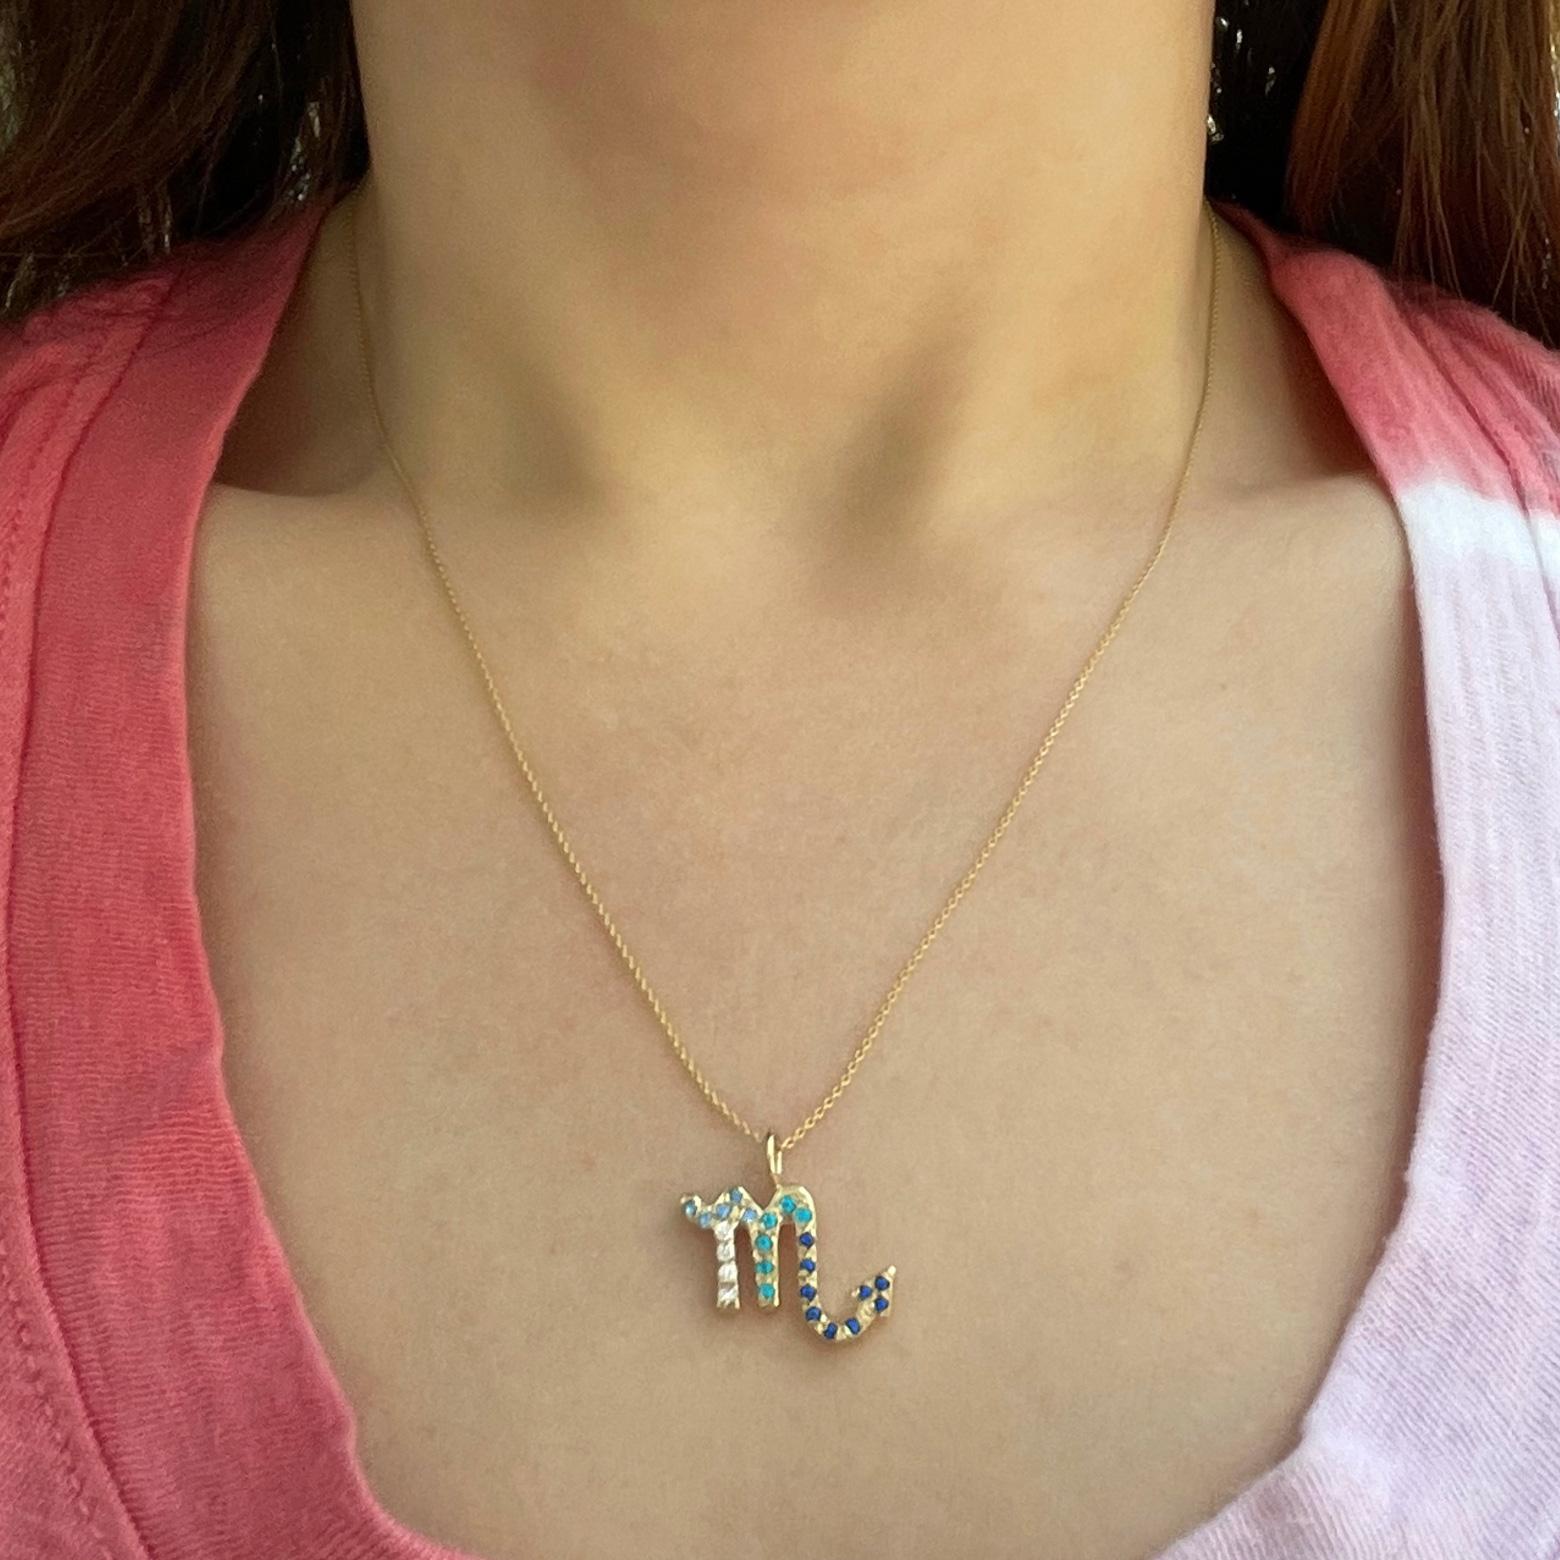 Scorpio zodiac sign charm pendant necklace